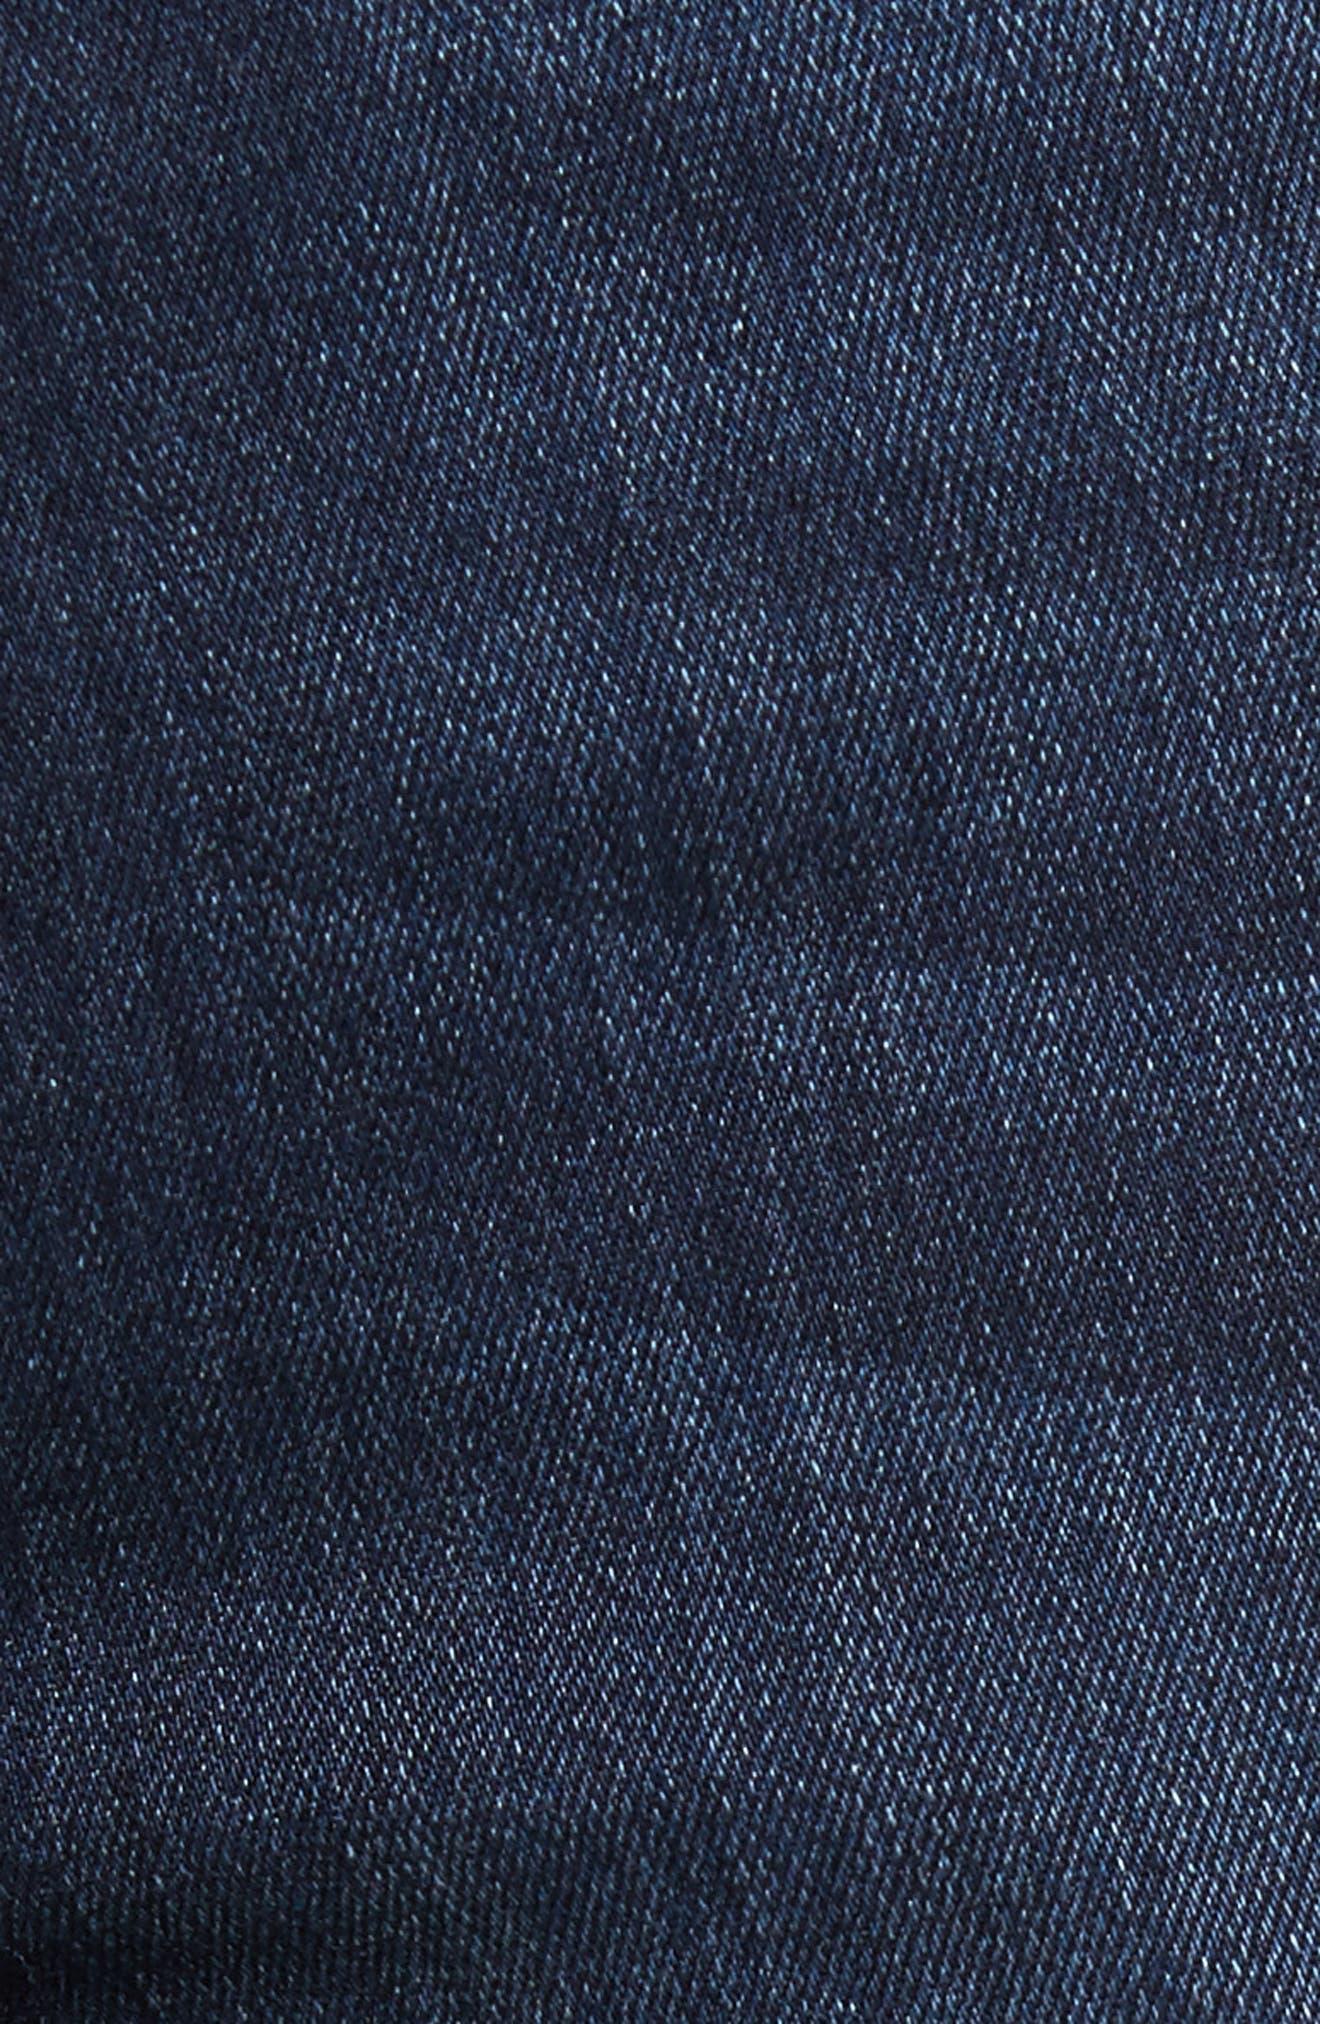 Transcend - Federal Slim Straight Leg Jeans,                             Alternate thumbnail 5, color,                             Barron